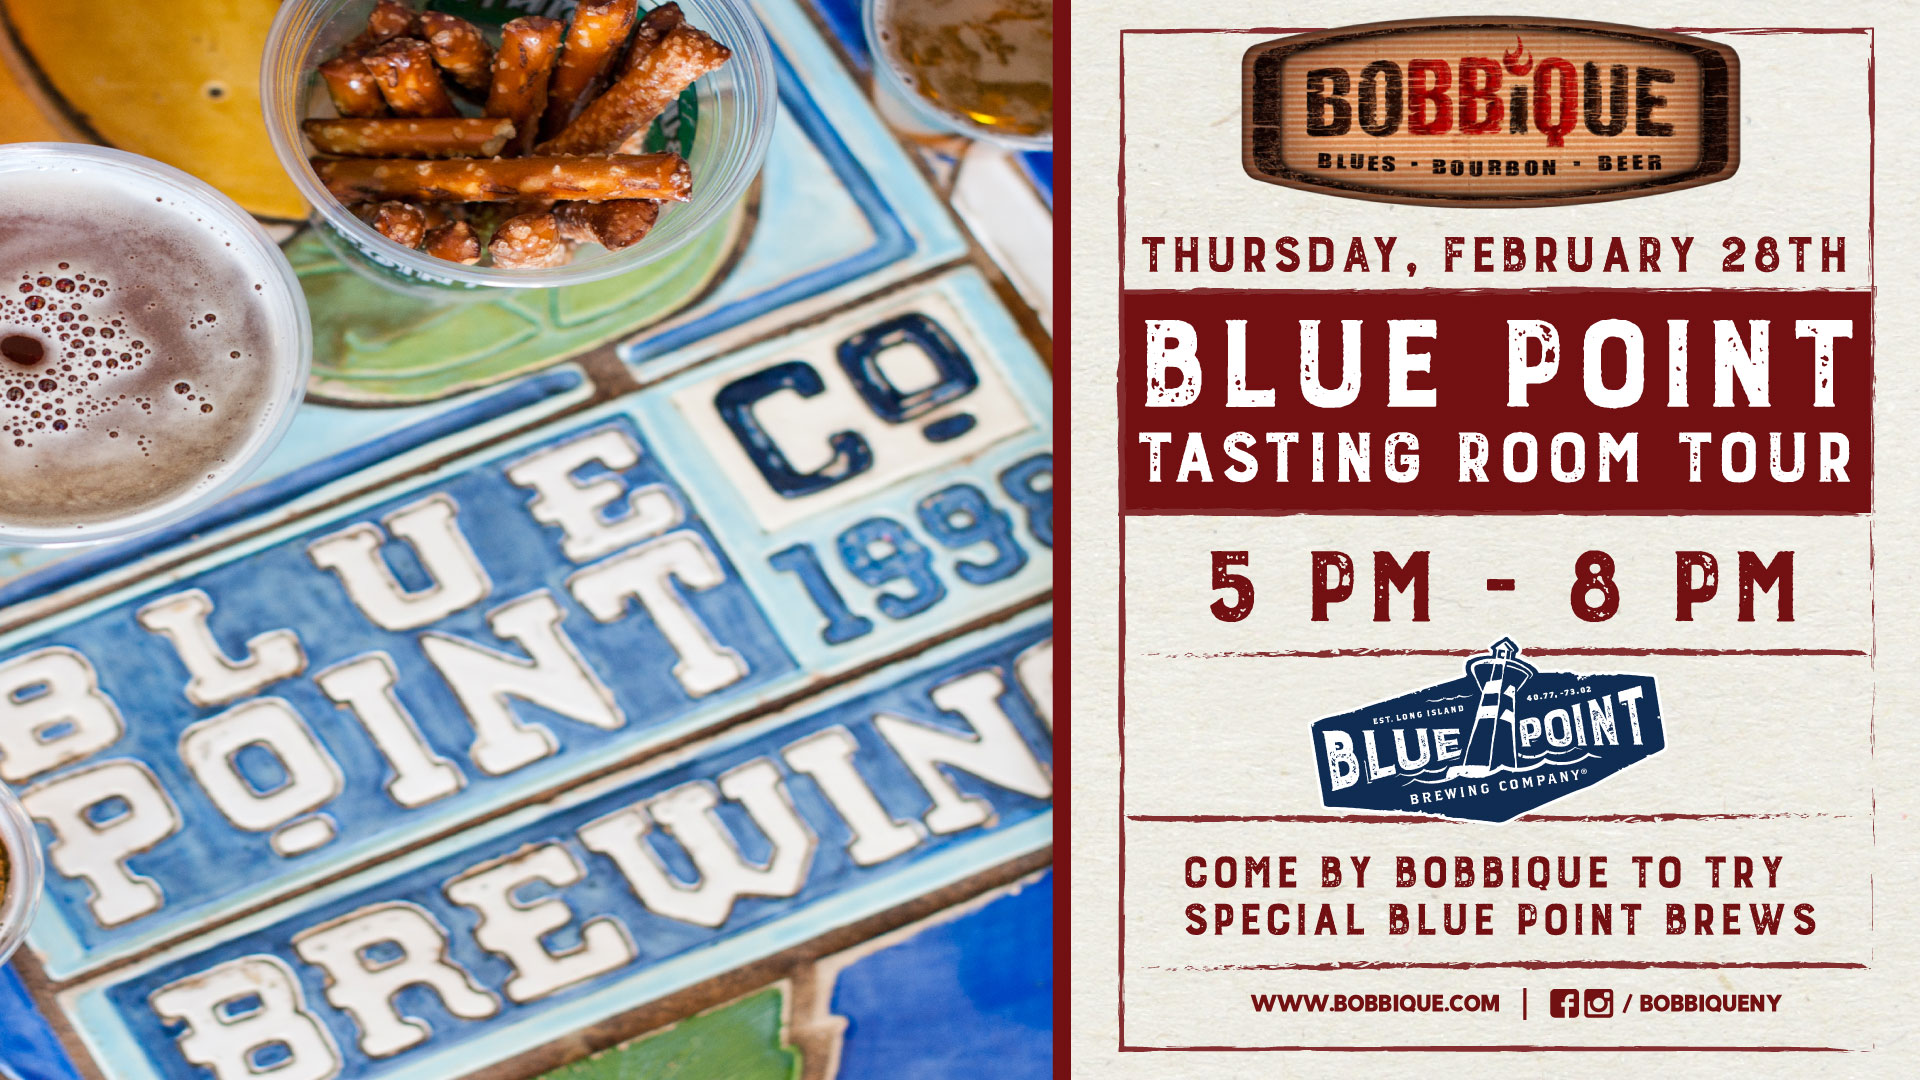 Blue Point Tasting Room Tour